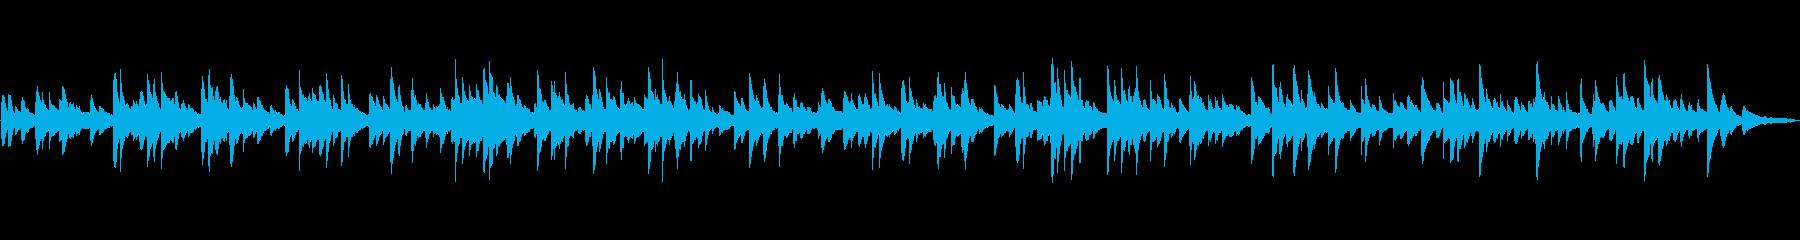 MCの邪魔をしない静かなピアノソロの再生済みの波形